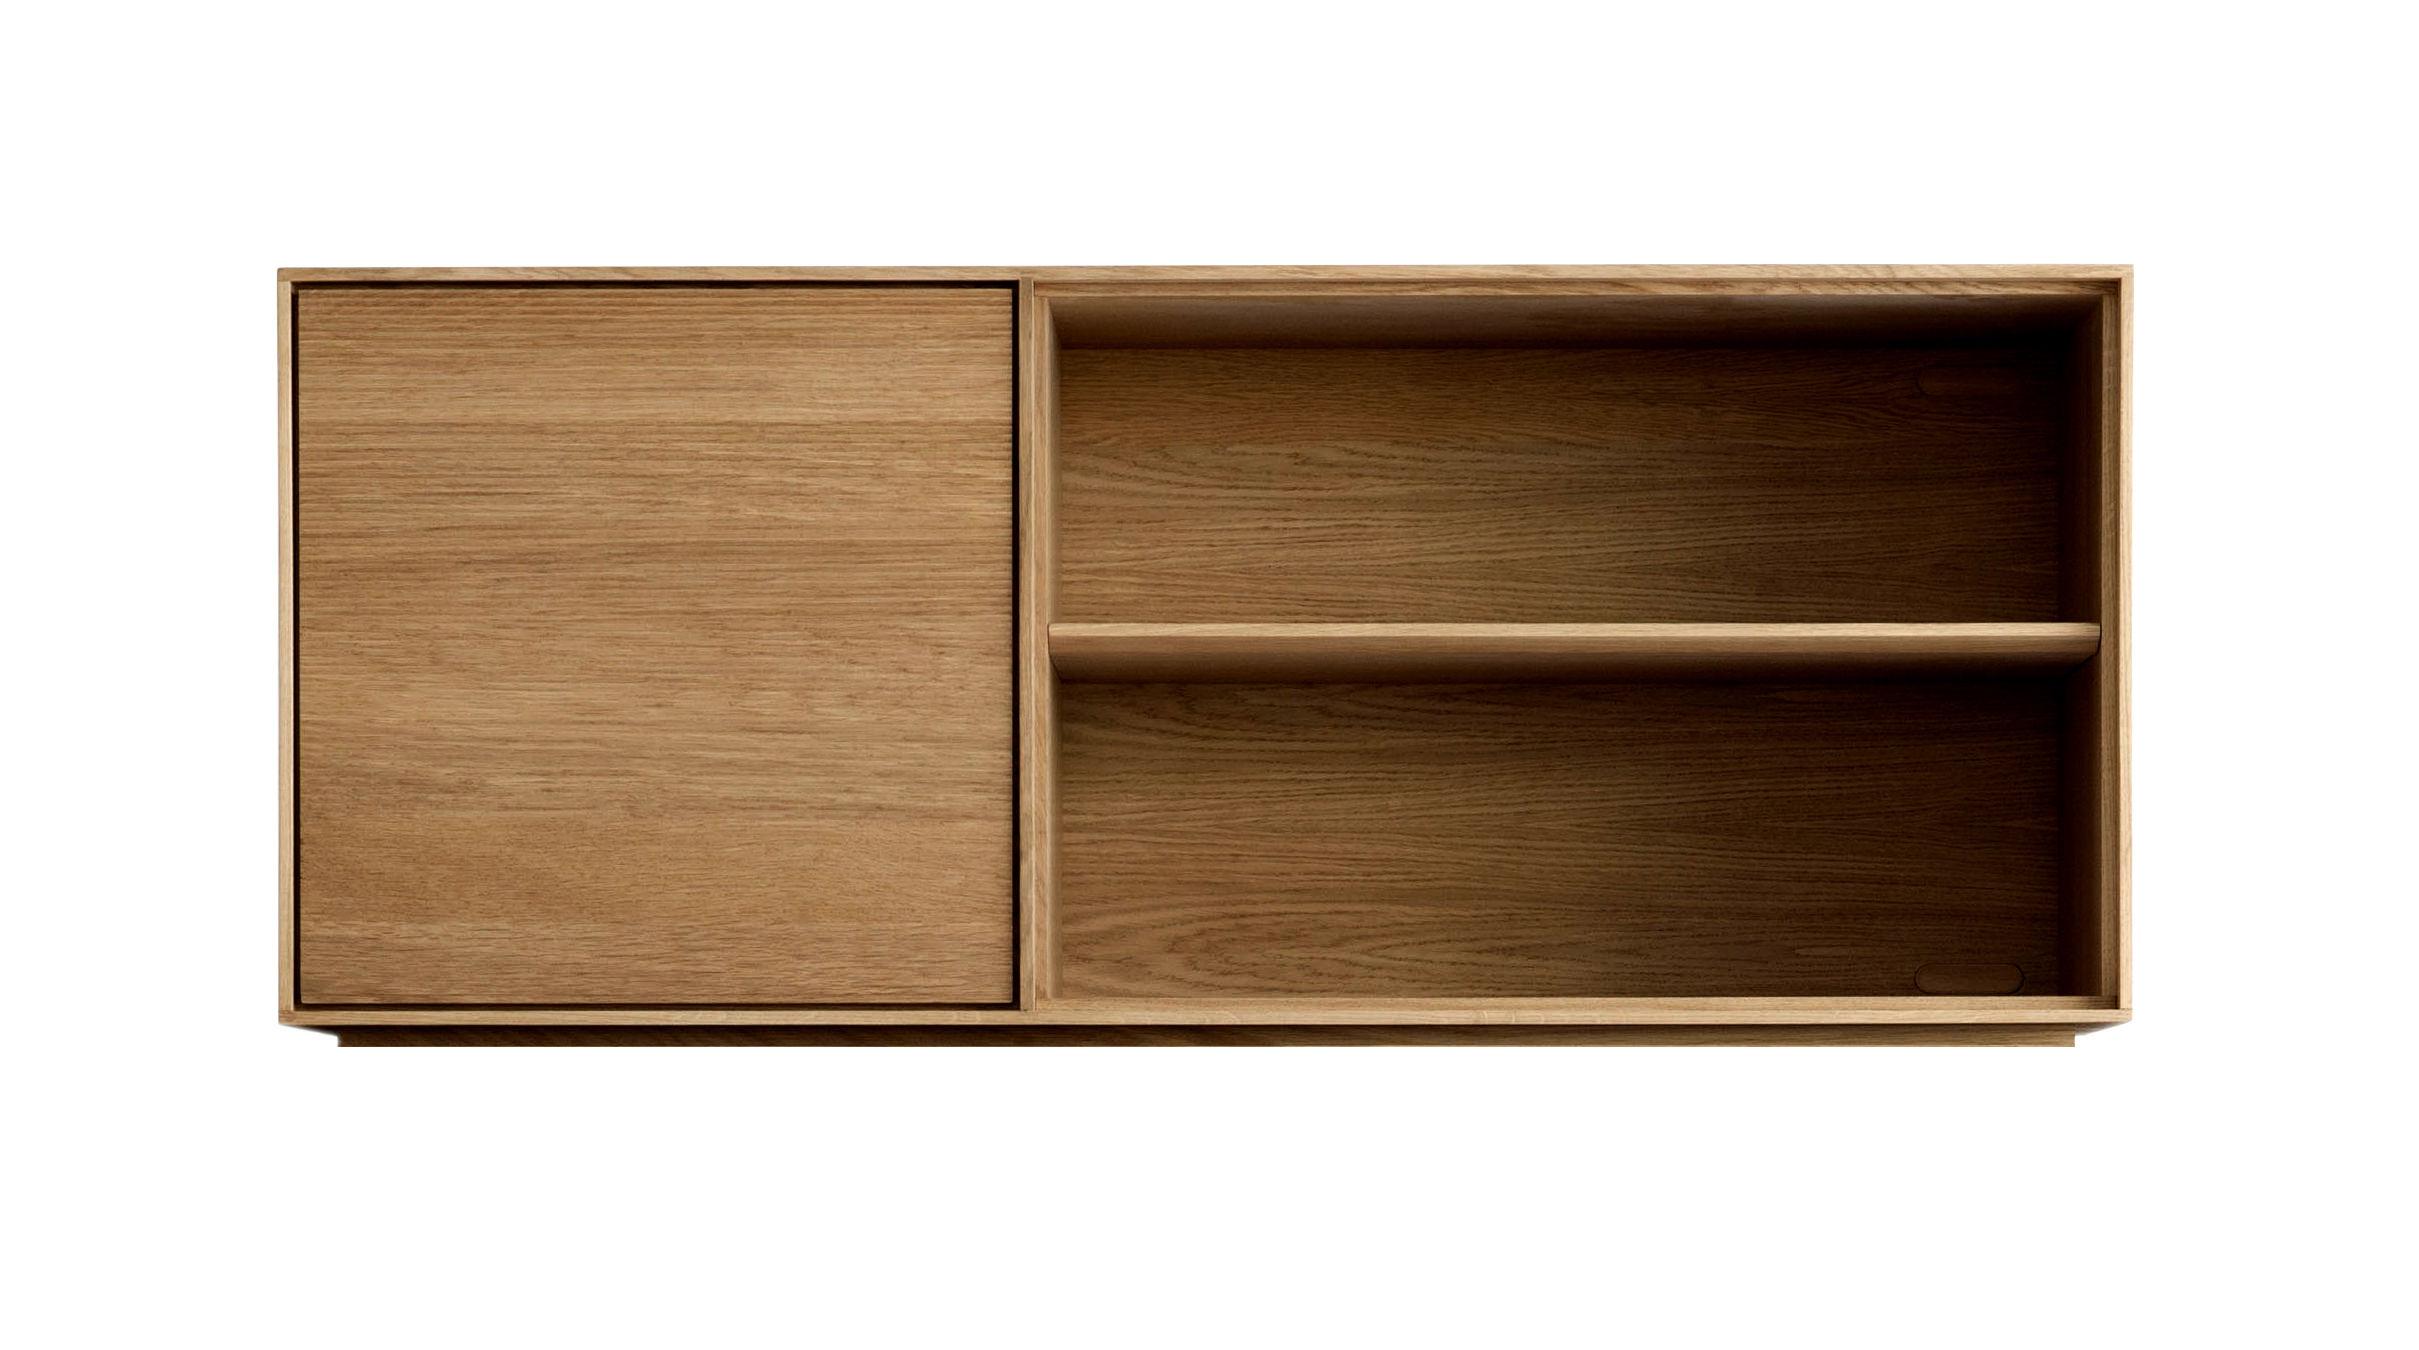 Furniture - Dressers & Storage Units - Modulo Stackable unit - / Intermediate - L 130 cm / Left door + 2 shelves by Ercol - Intermediate position / Oak - Solid oak